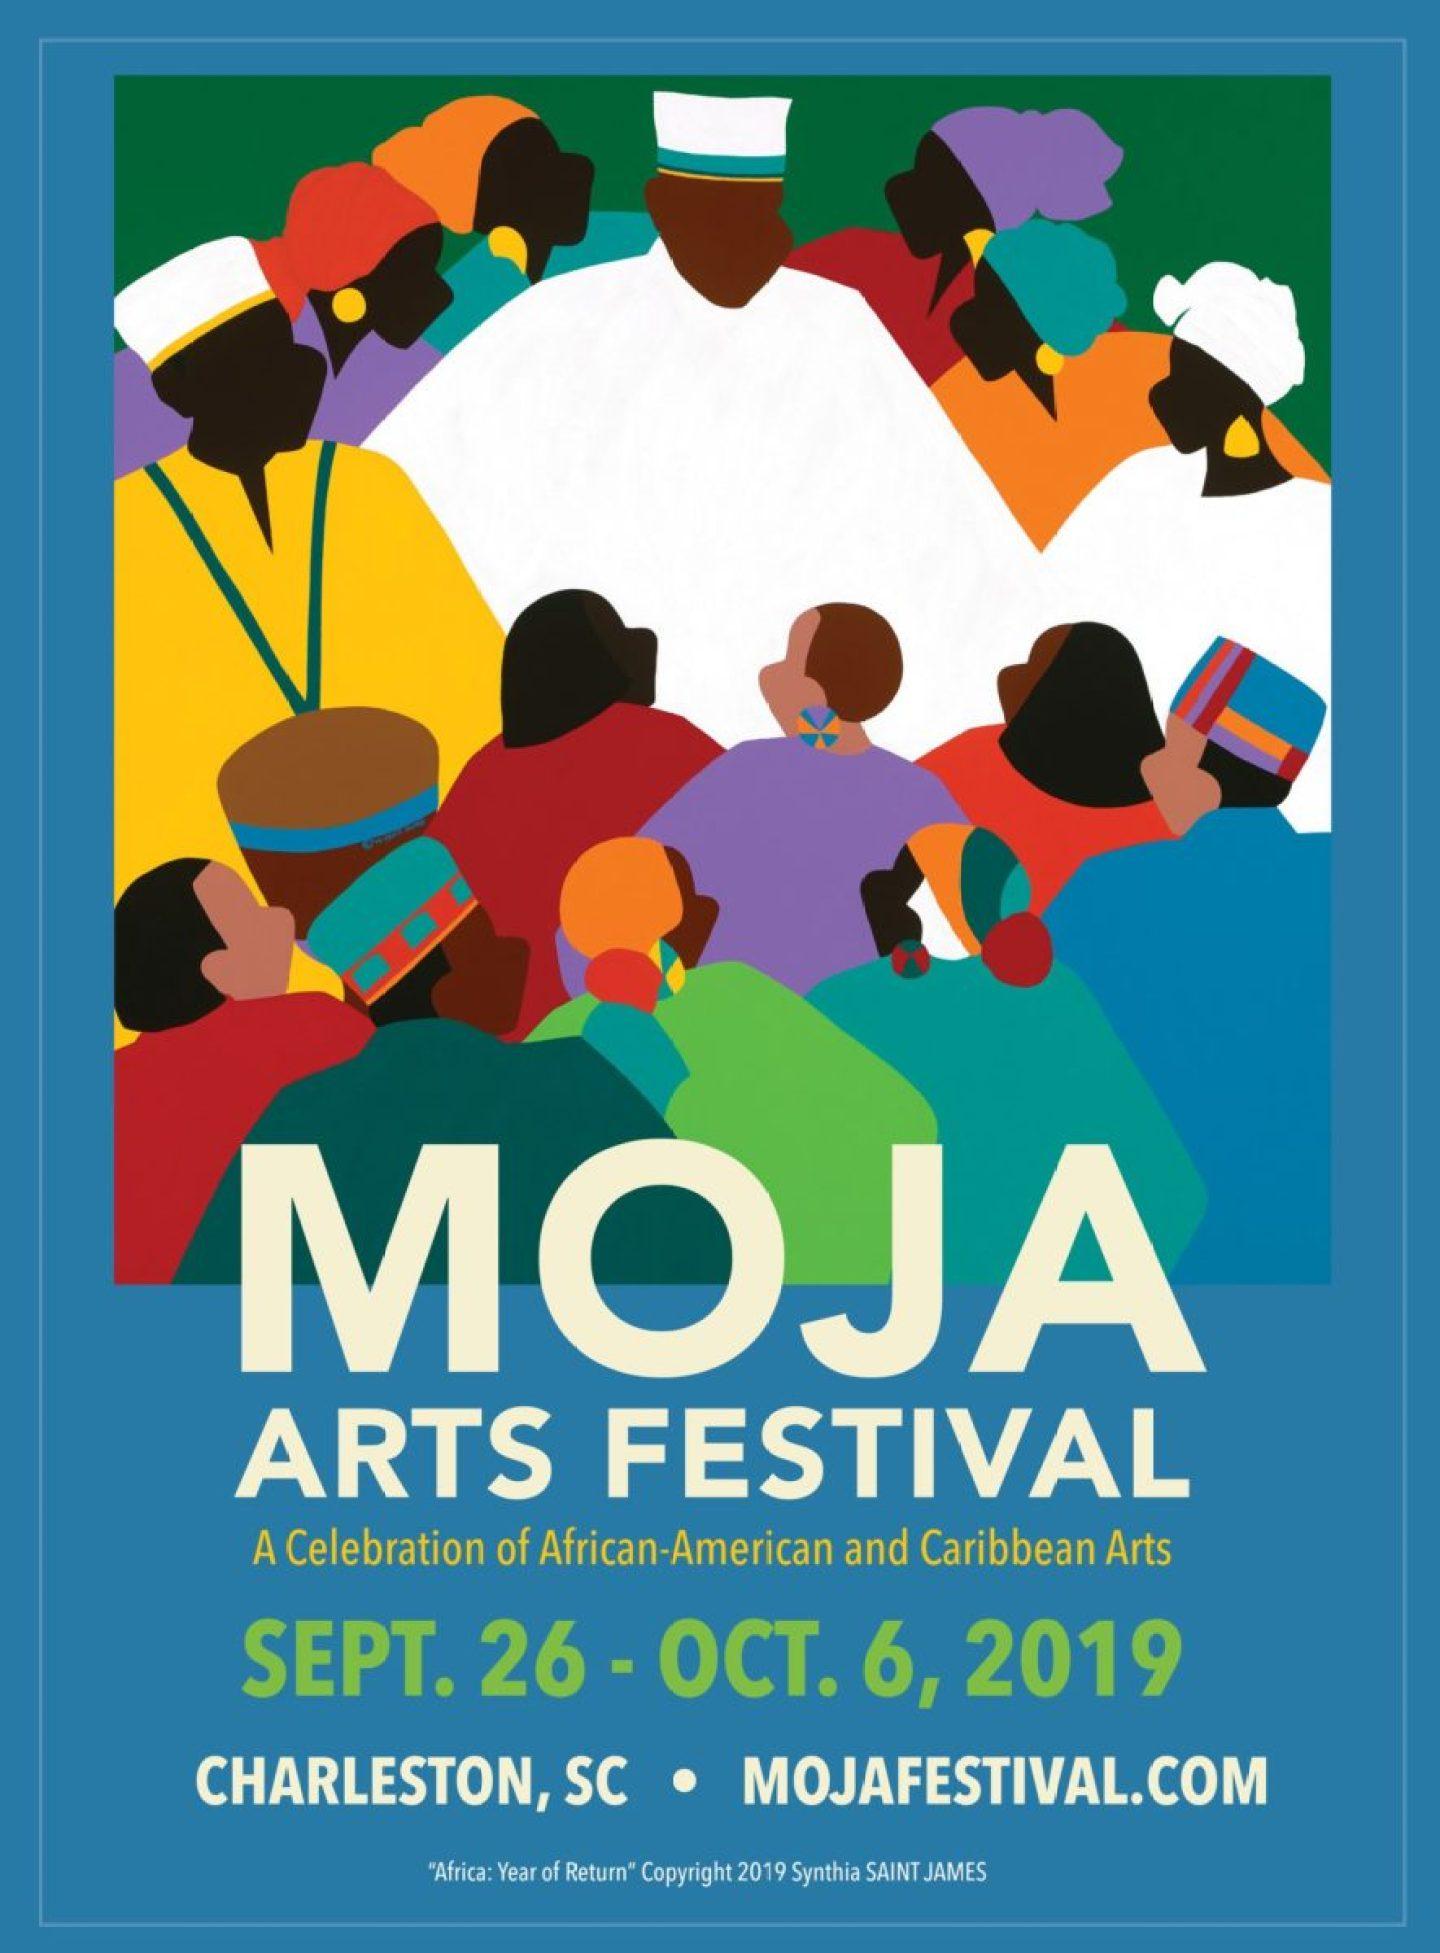 68678750_10157575548677783_669557058957213696_o-1440x1953 Fall Heritage Travel: 2019 MOJA Arts Festival